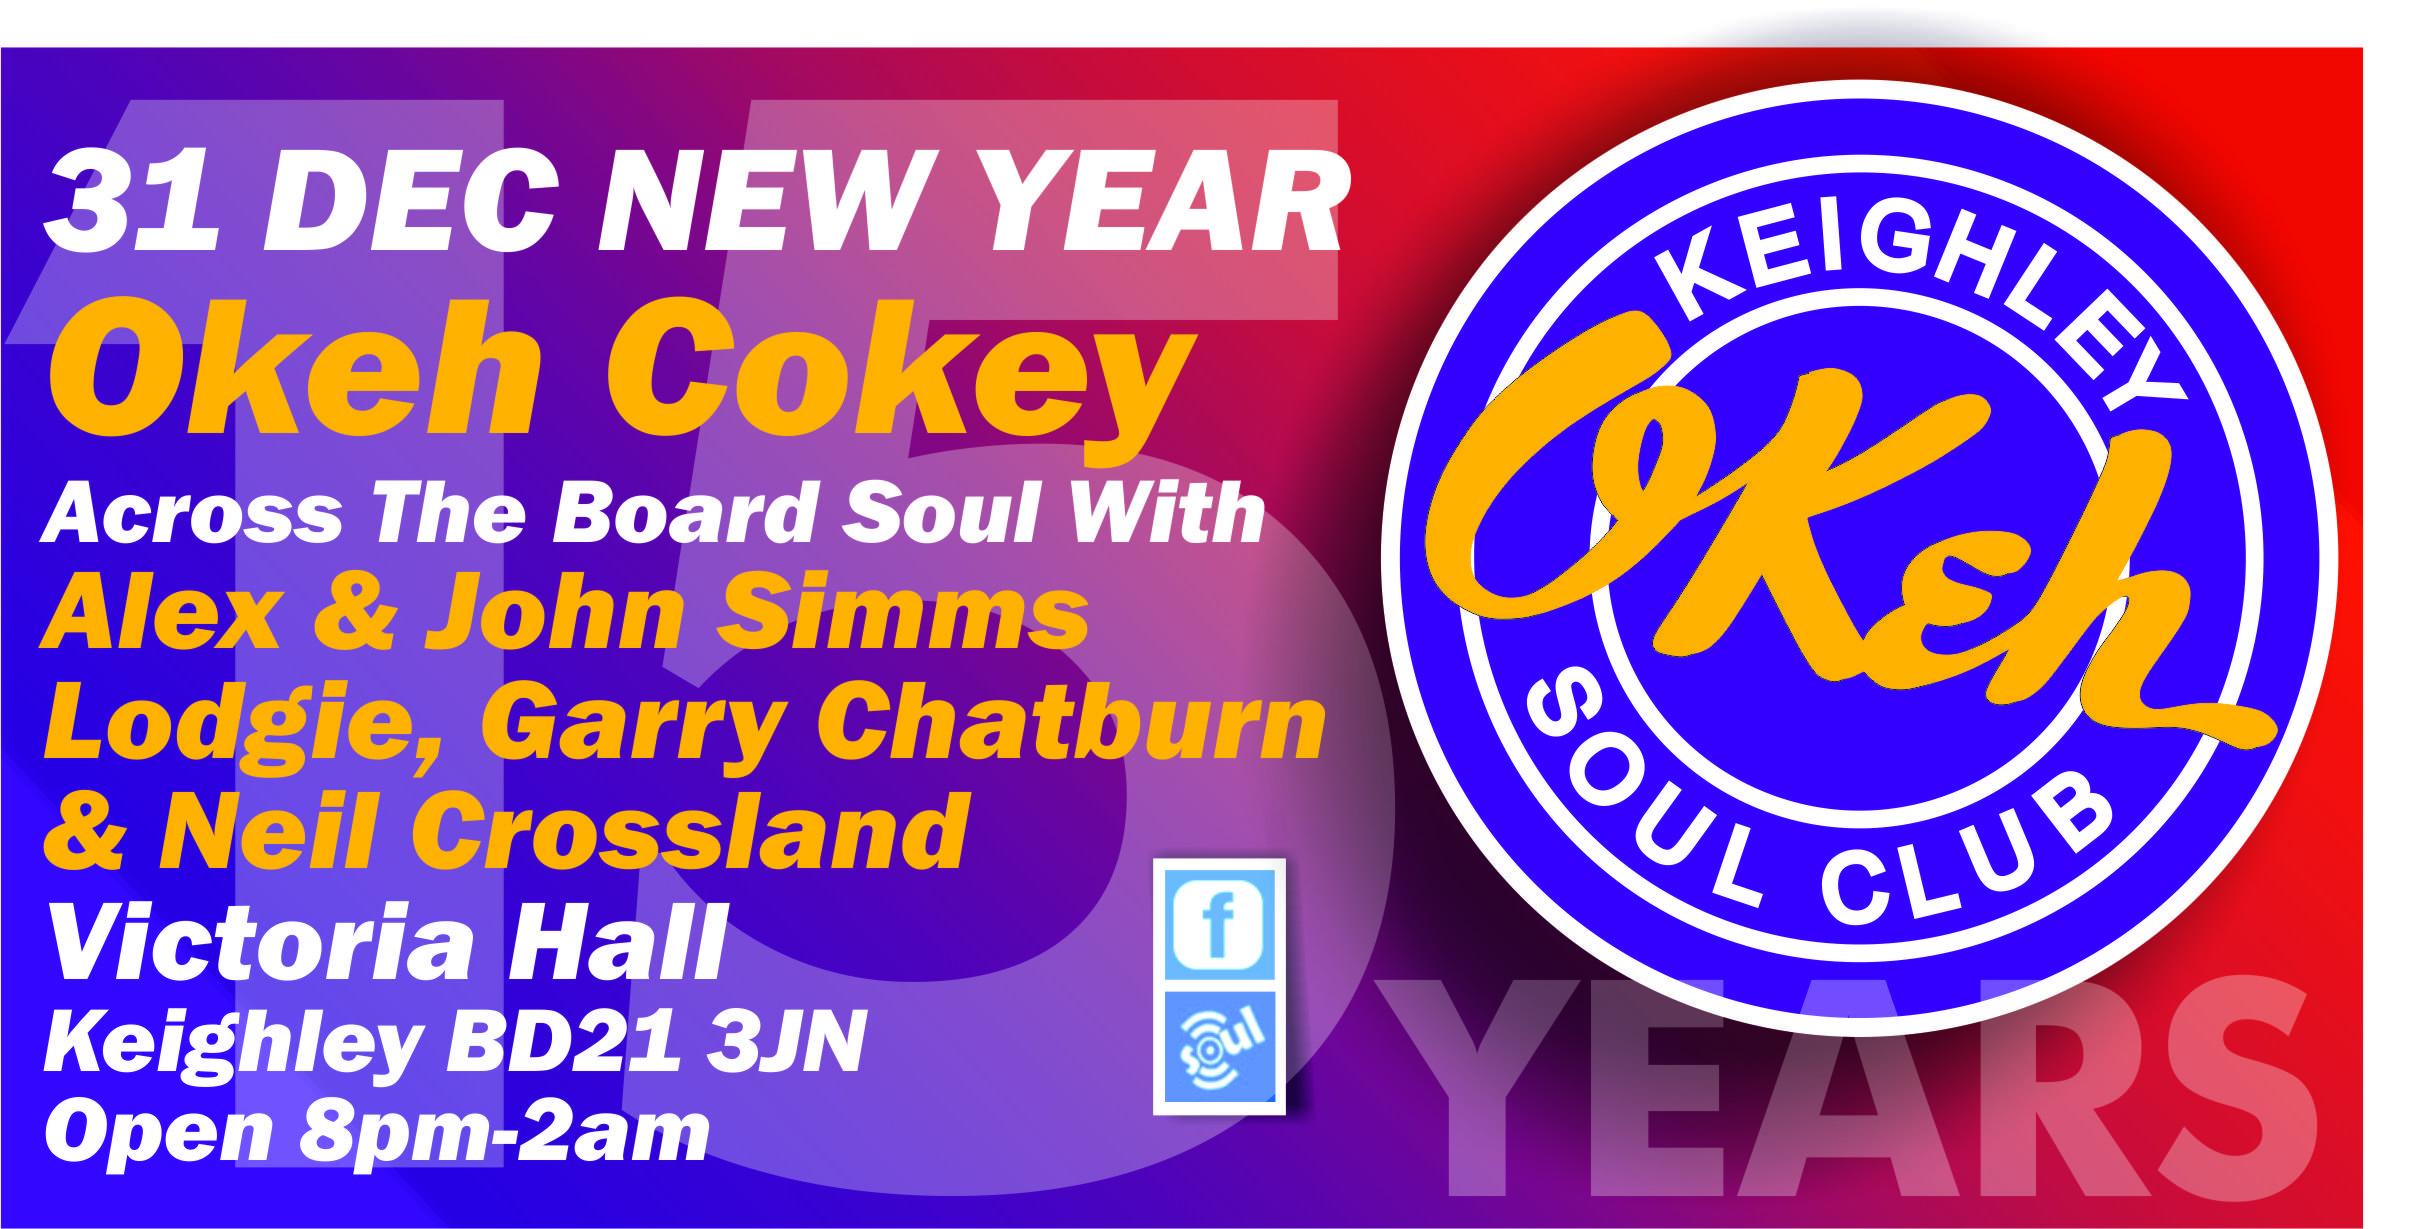 New Year Okeh Cokey flyer